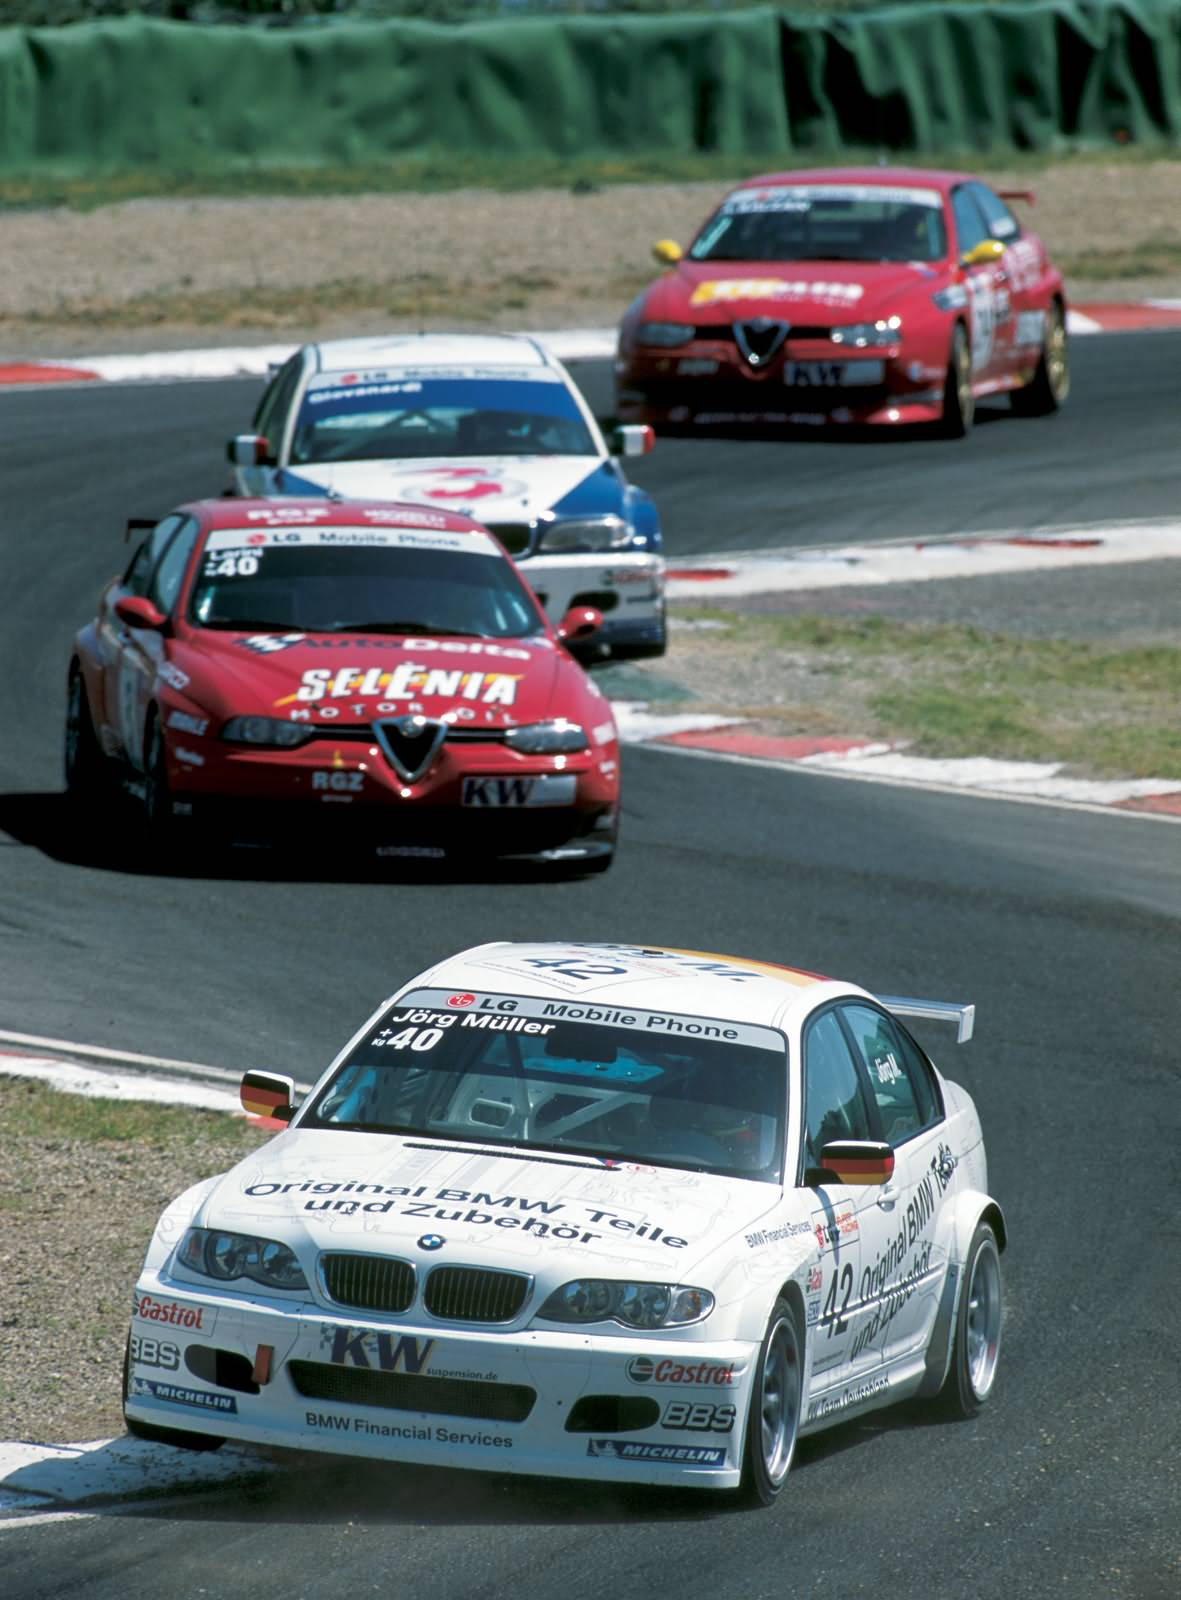 ETCC 2003 - BMW 320i vorne Jörg Müller (DEU) hinten Pergusa (ITA)